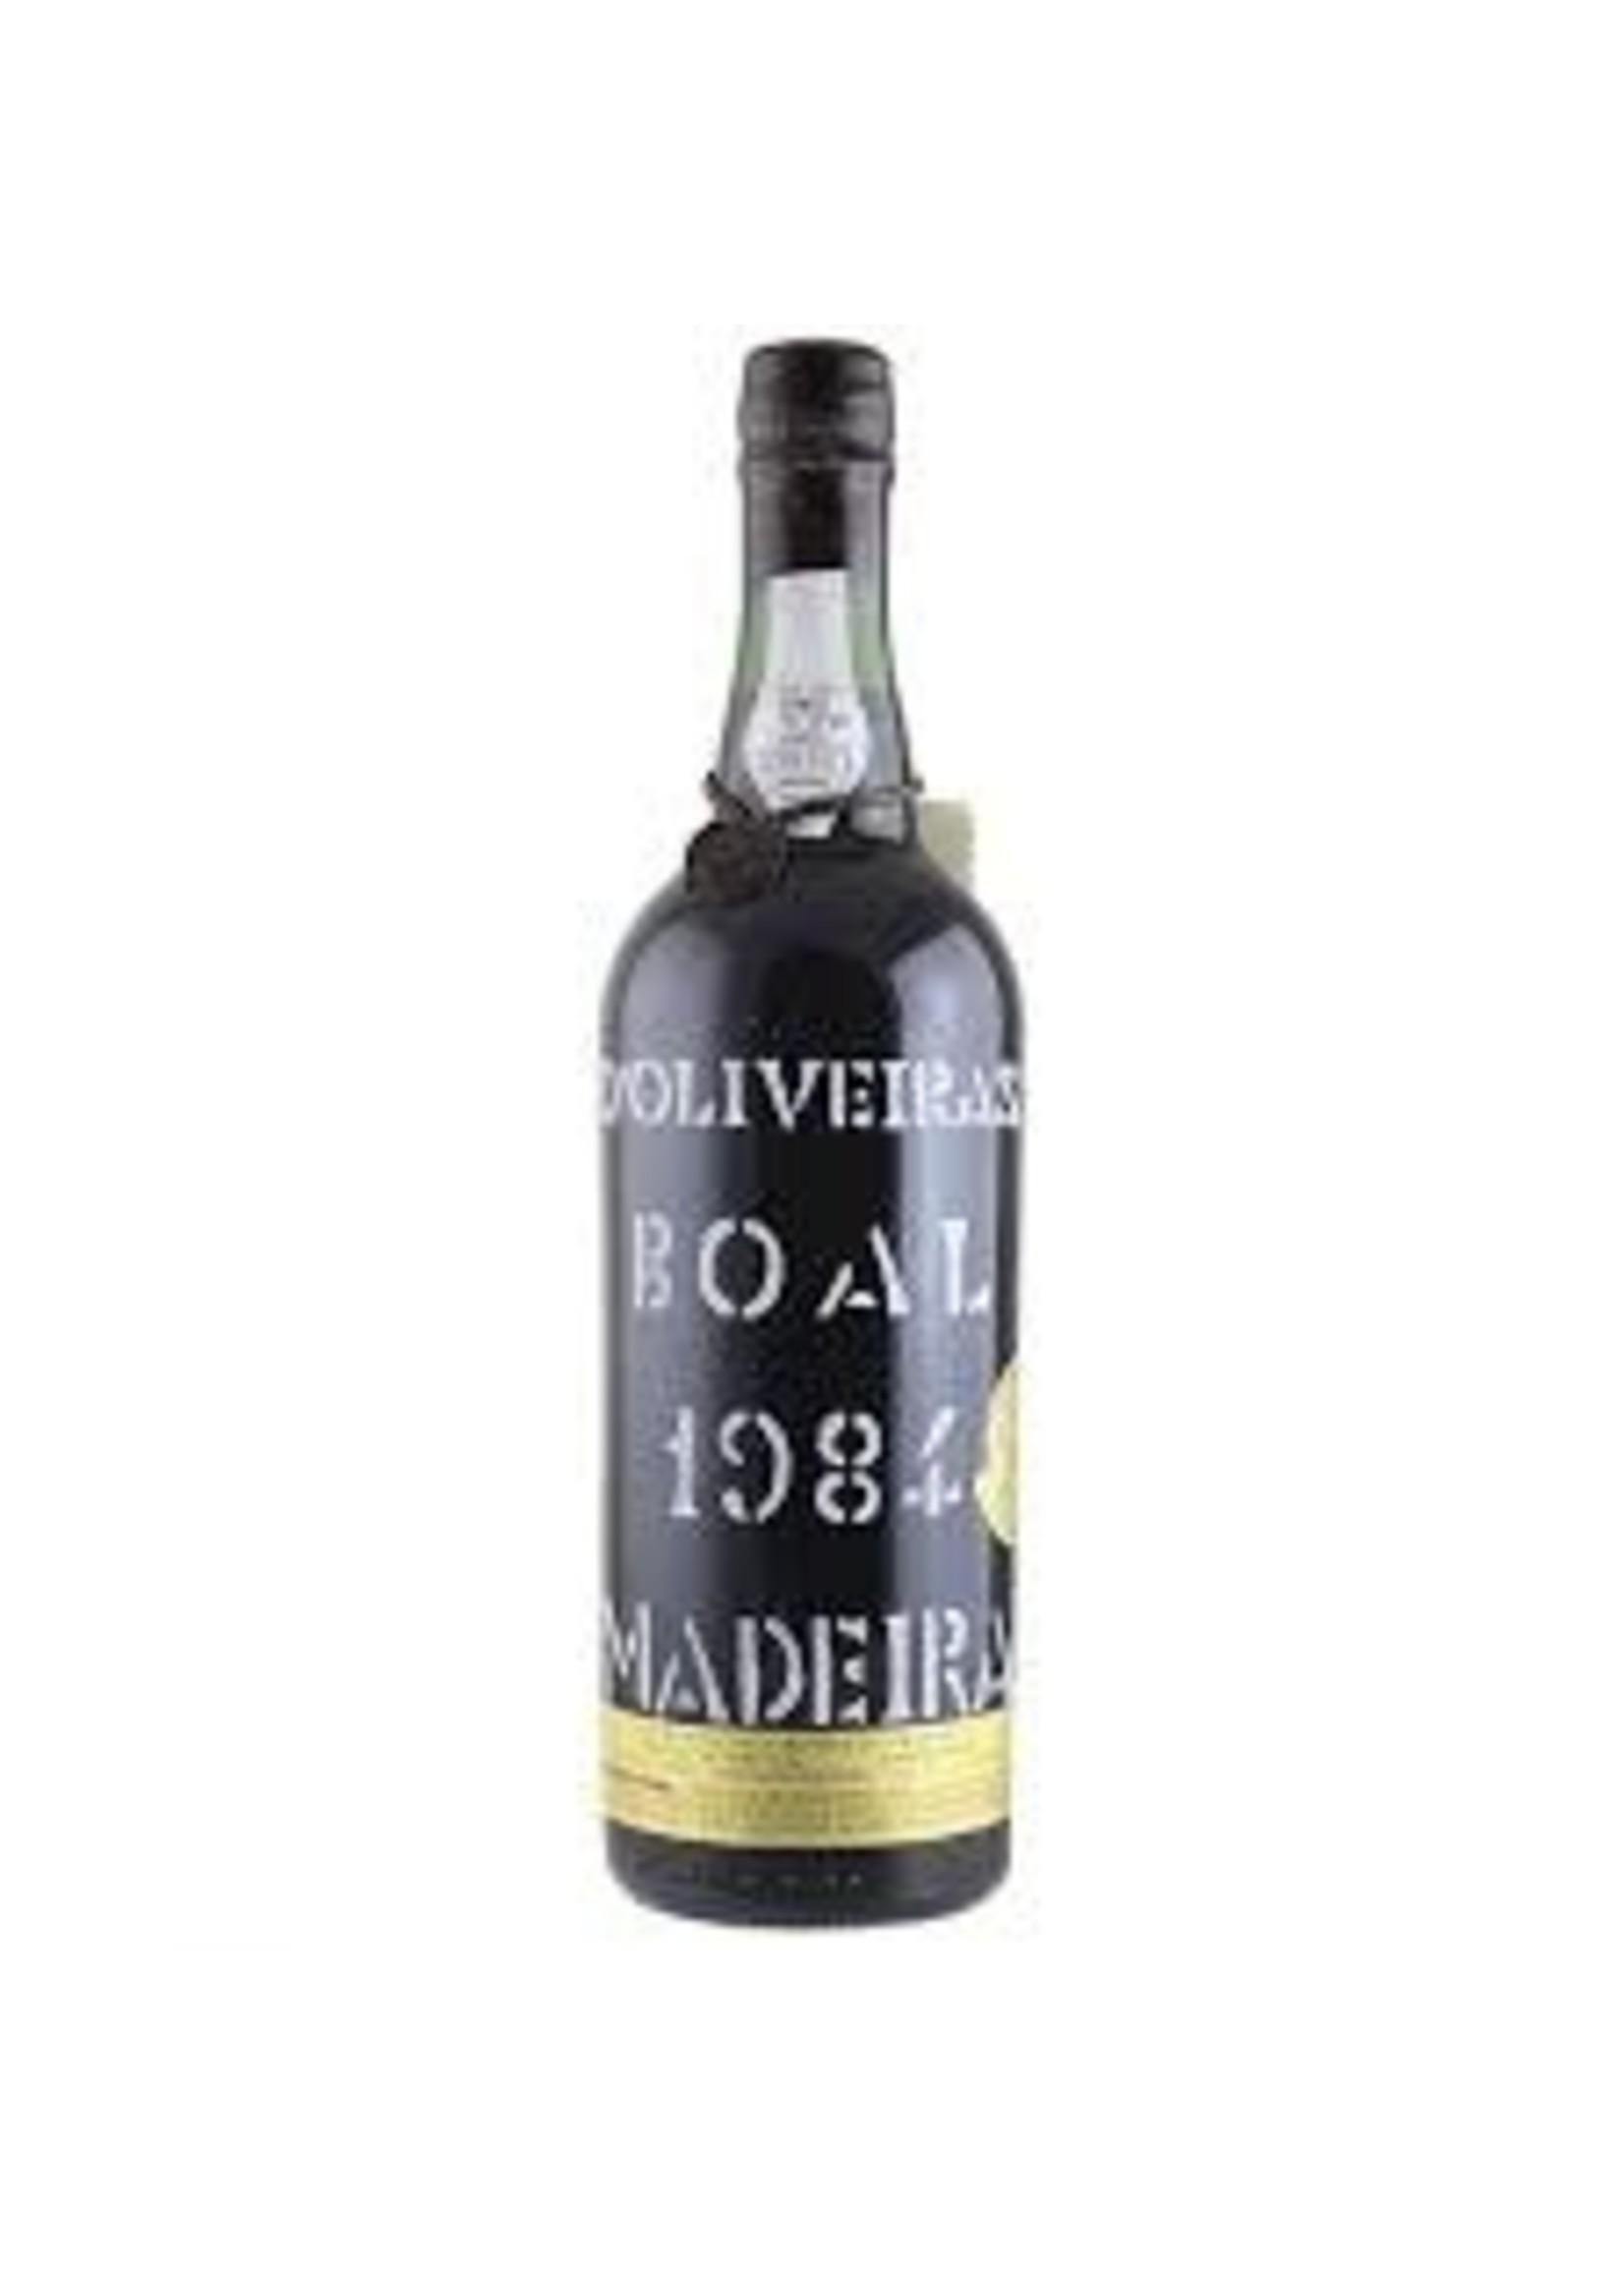 D'Oliveira 1984 Bual Maderia 750ml